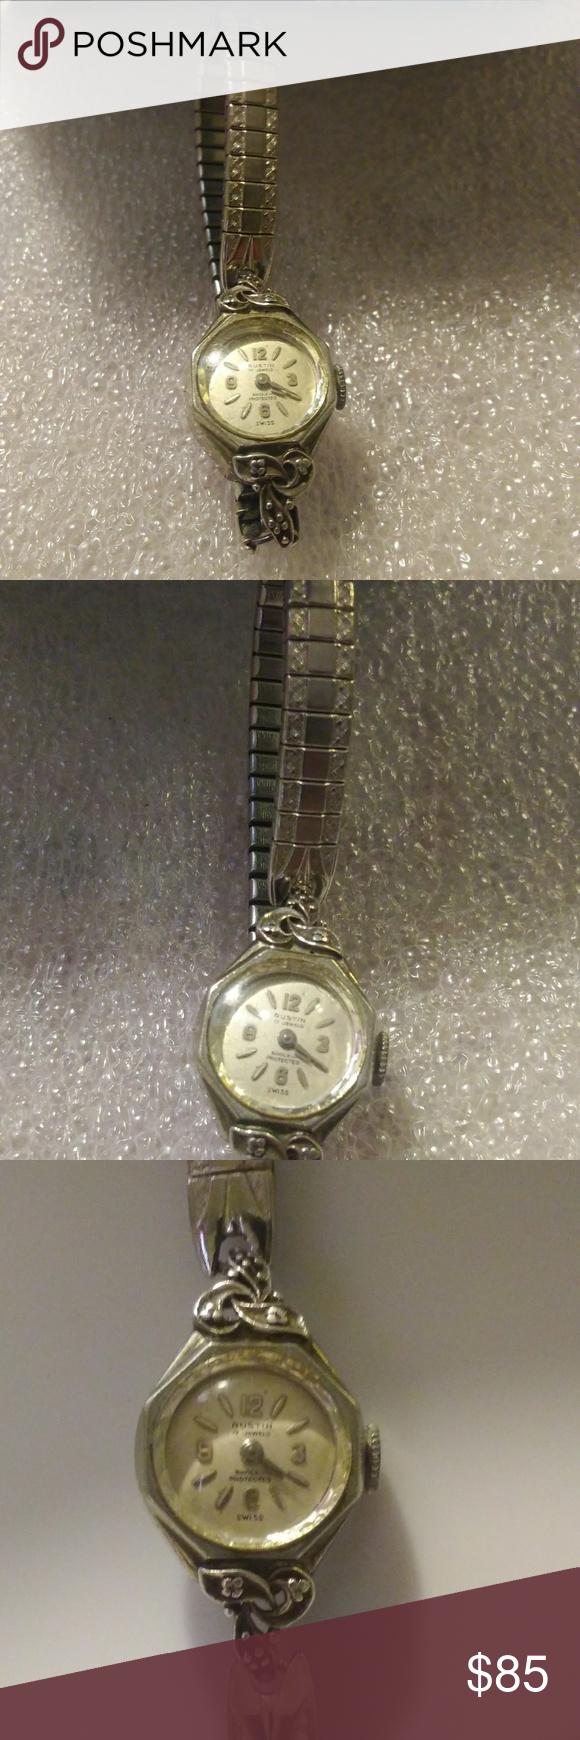 44494e46afff8 Vintage Austin white gold watch Vintage white 10krg Austin 17 jewels ...